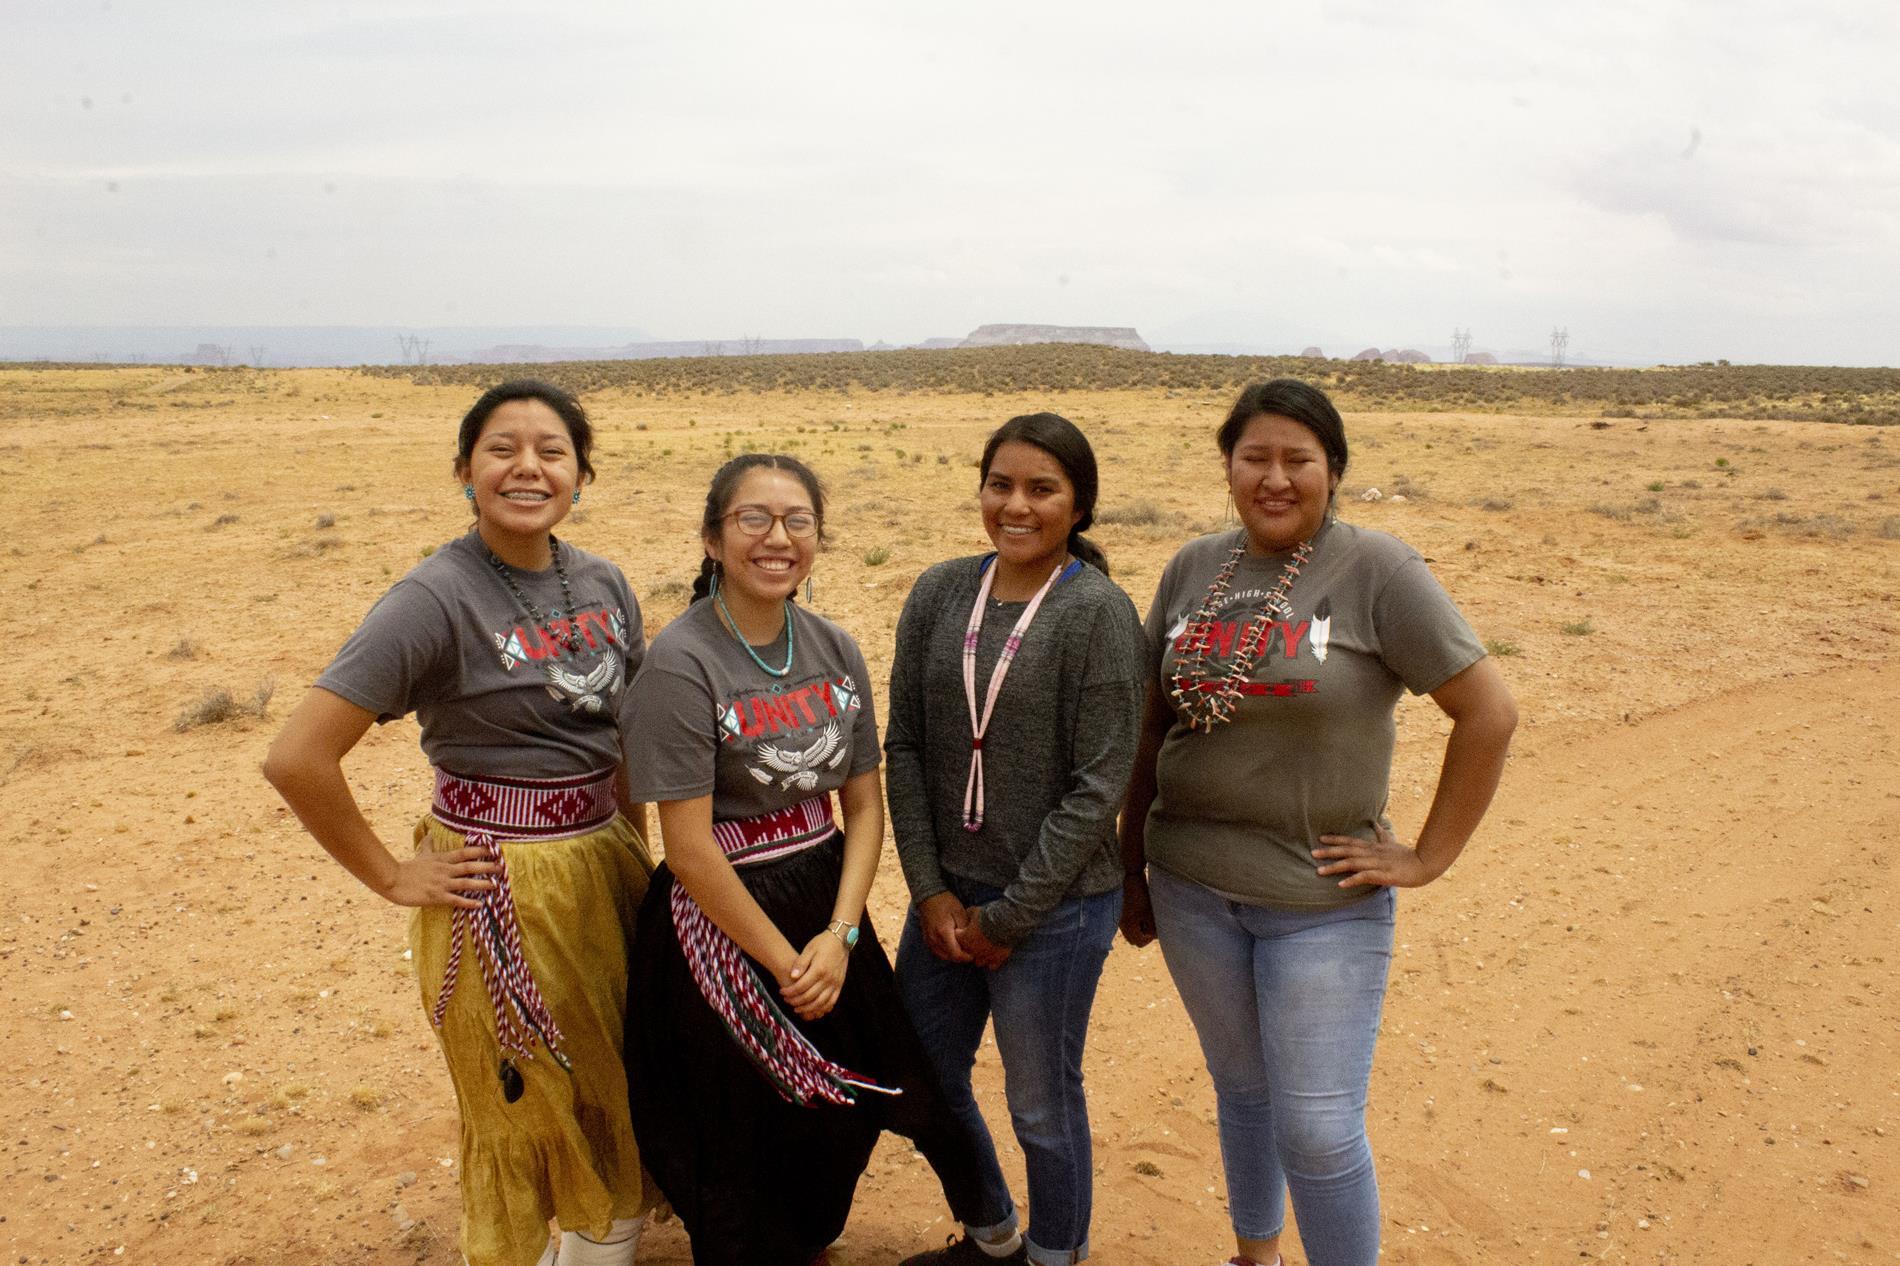 Navajo students wearing traditional clothing.